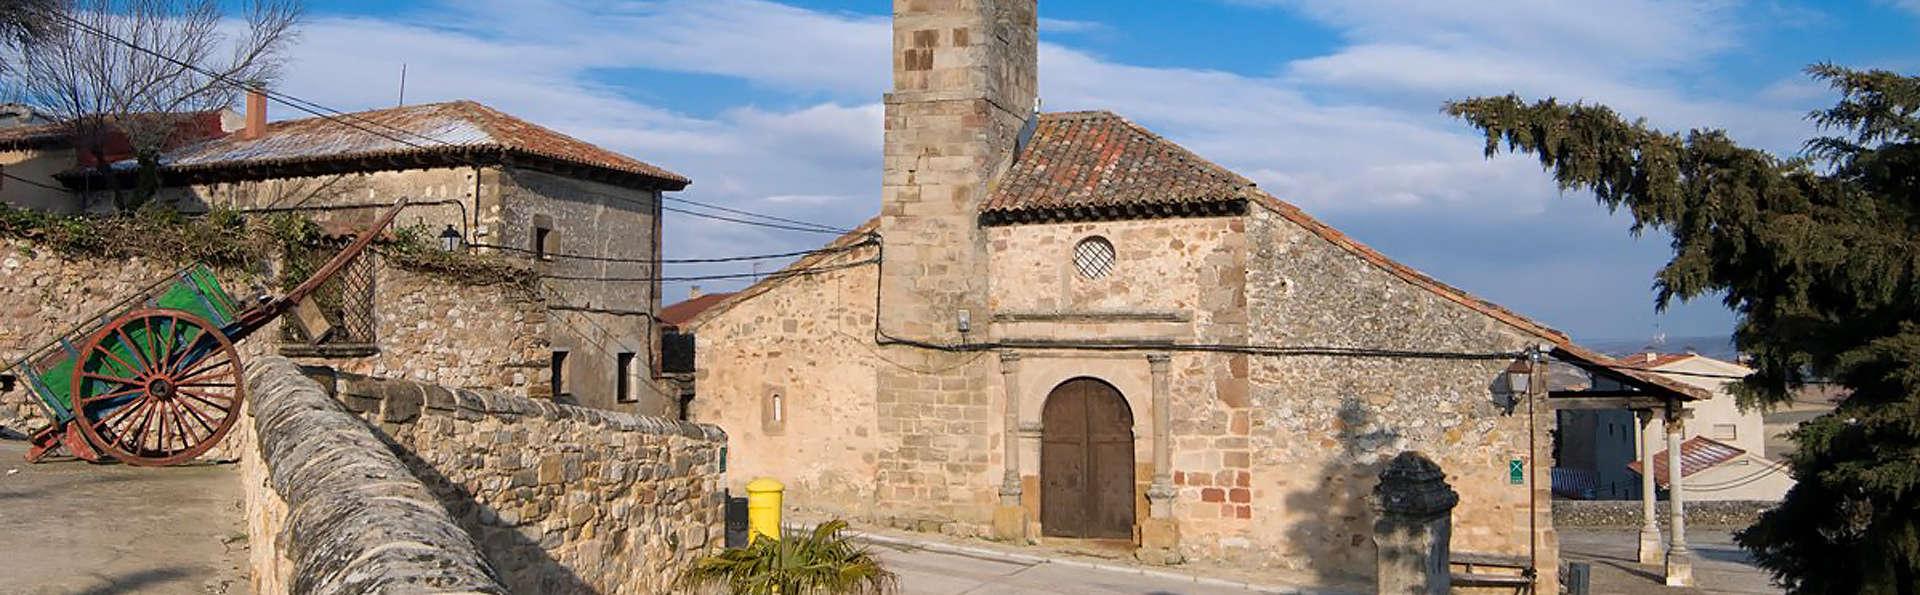 Hotel Convento Santa Ana - edit_Iglesia-Museo-de-San-Gil.-Iglesia-Romanica.jpg